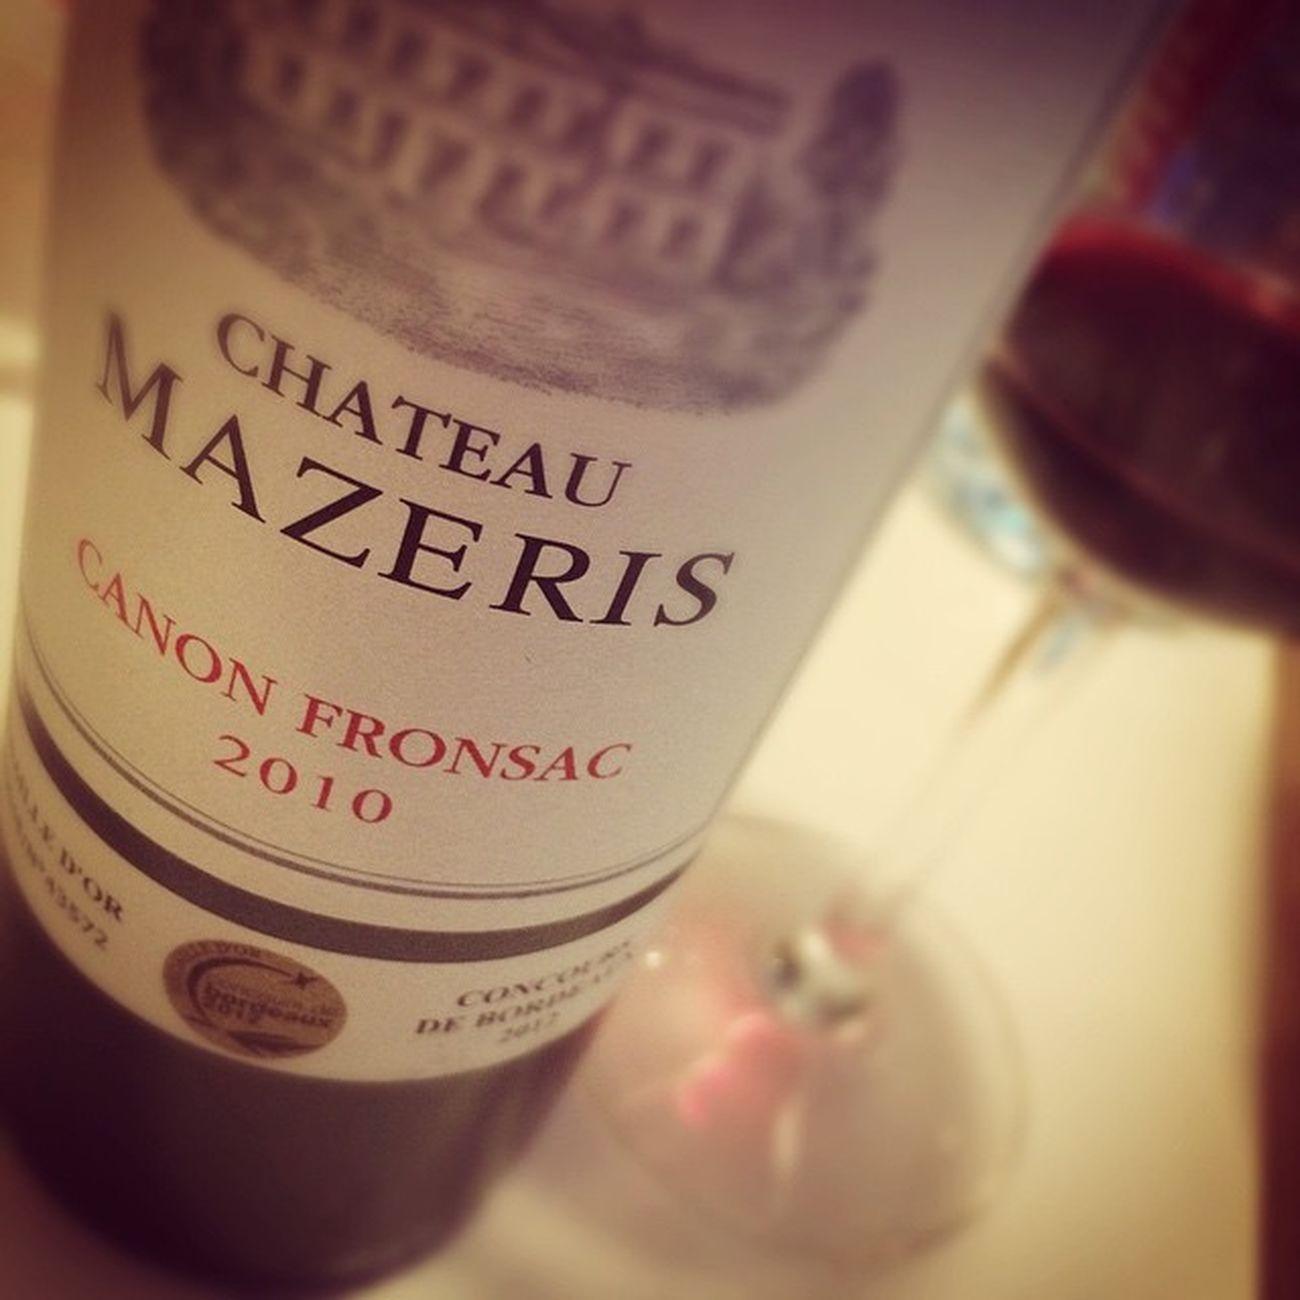 Fronsac. Winolife Instawine Winestagram Redwine Bordeaux